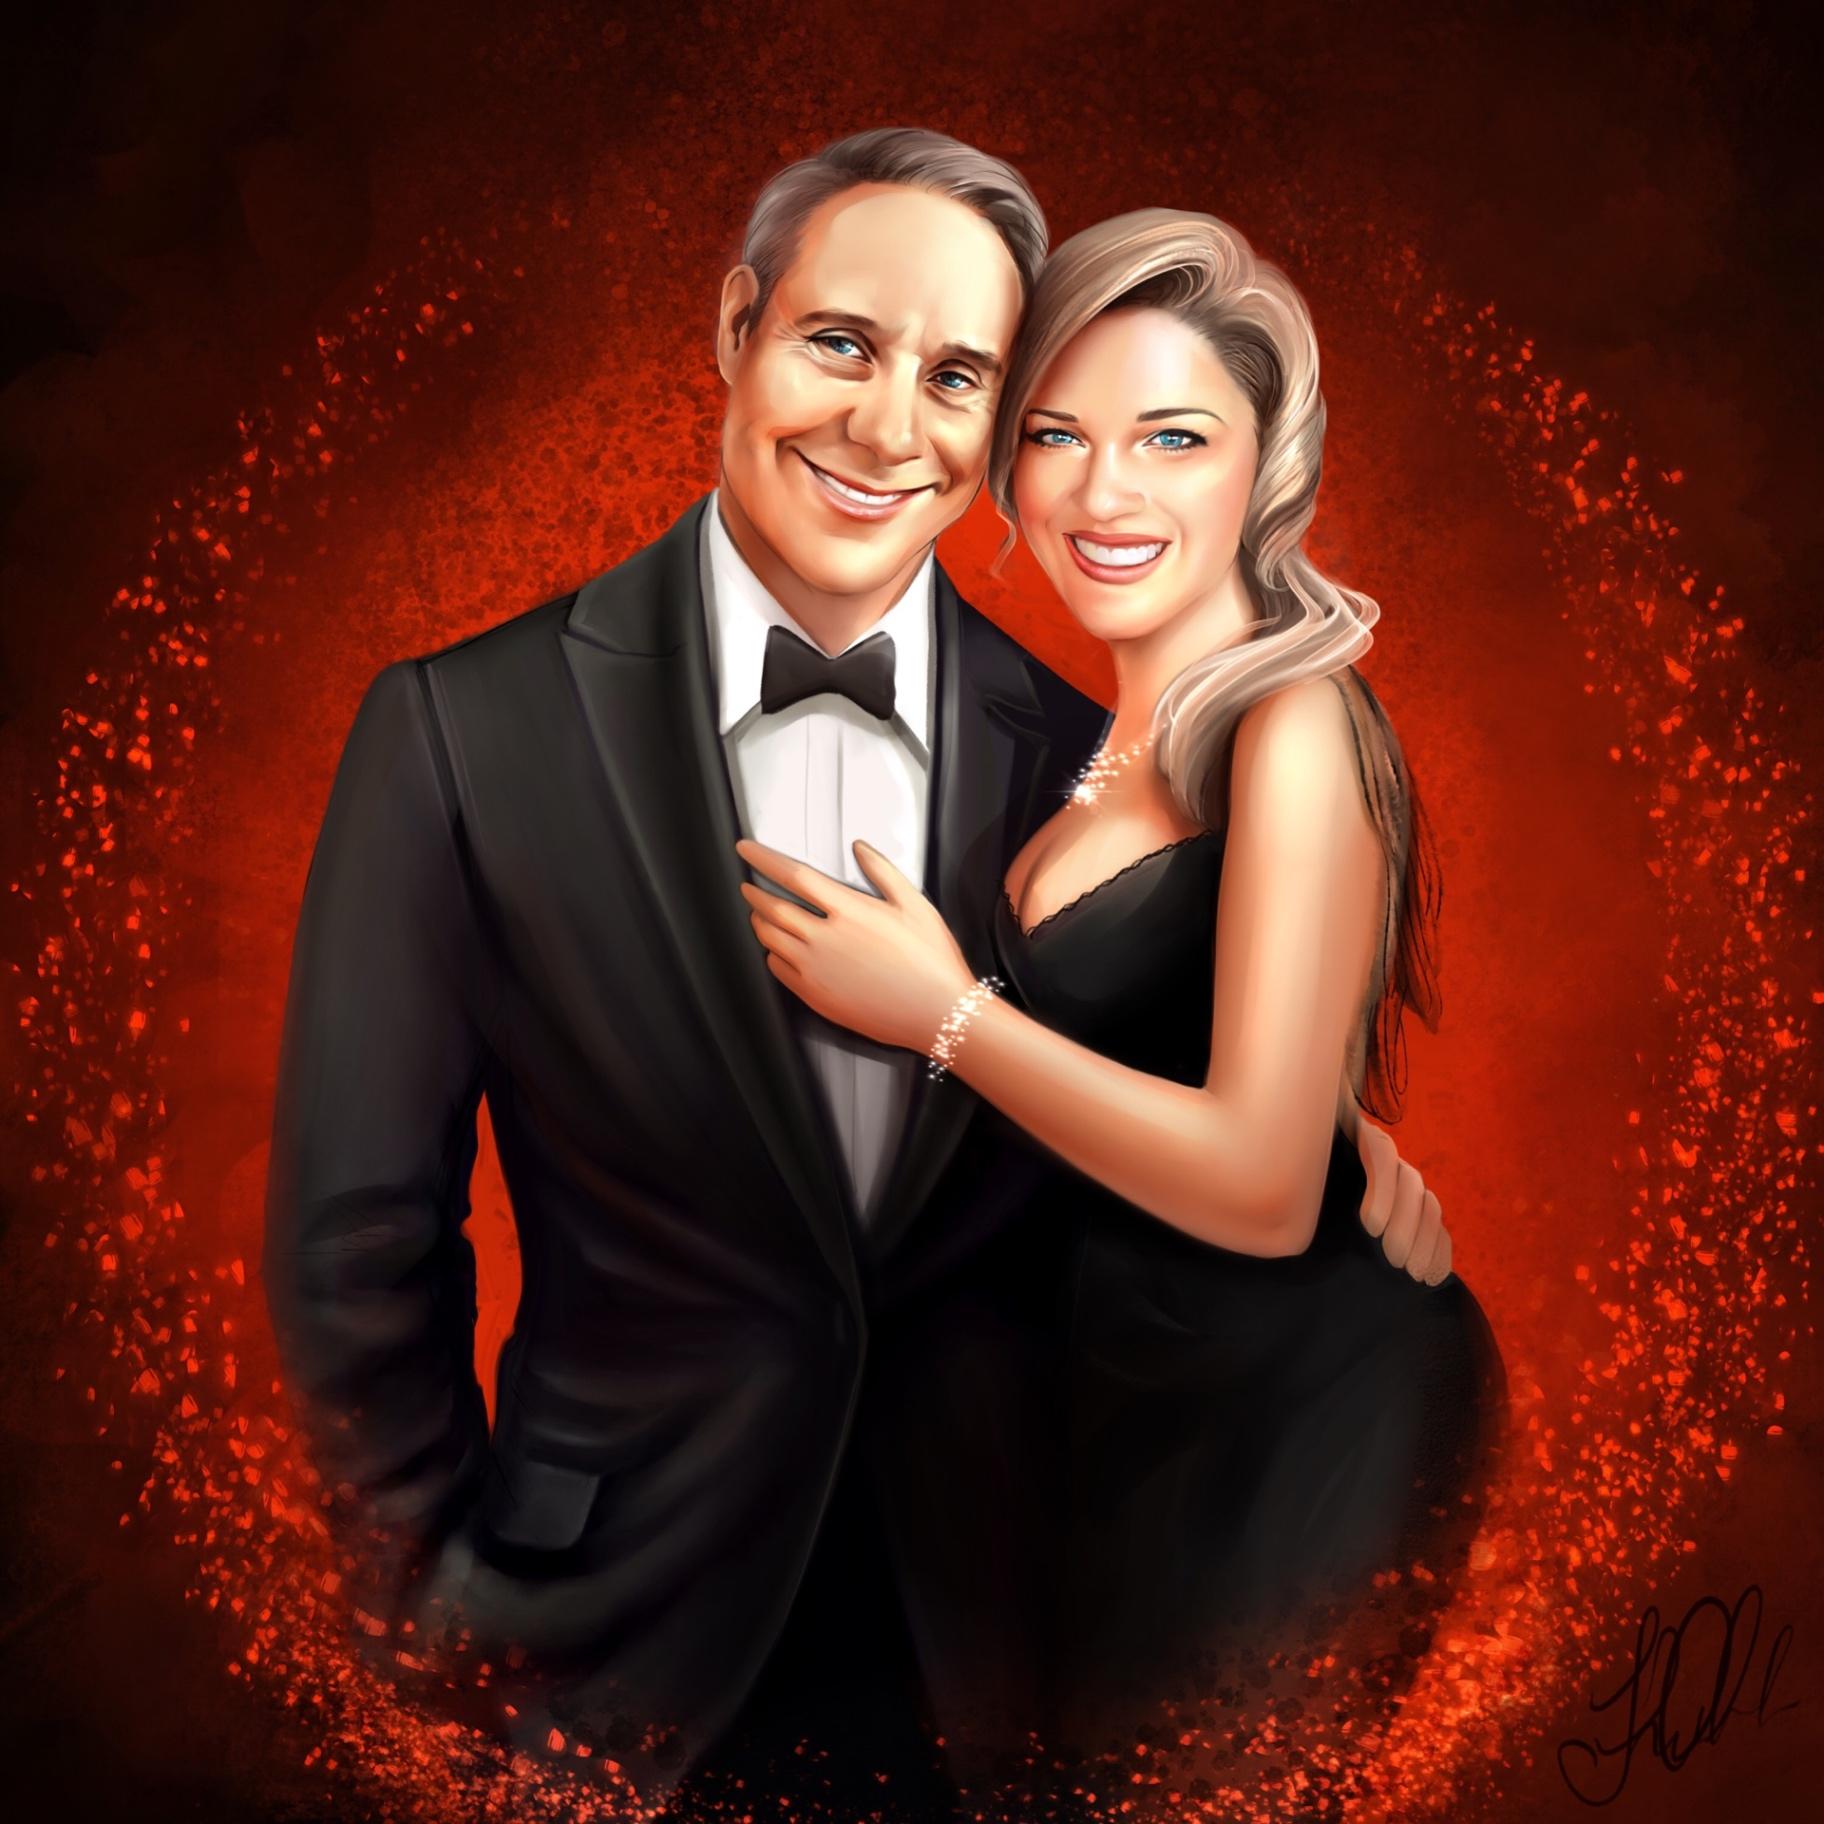 Digital artwork of couple photo